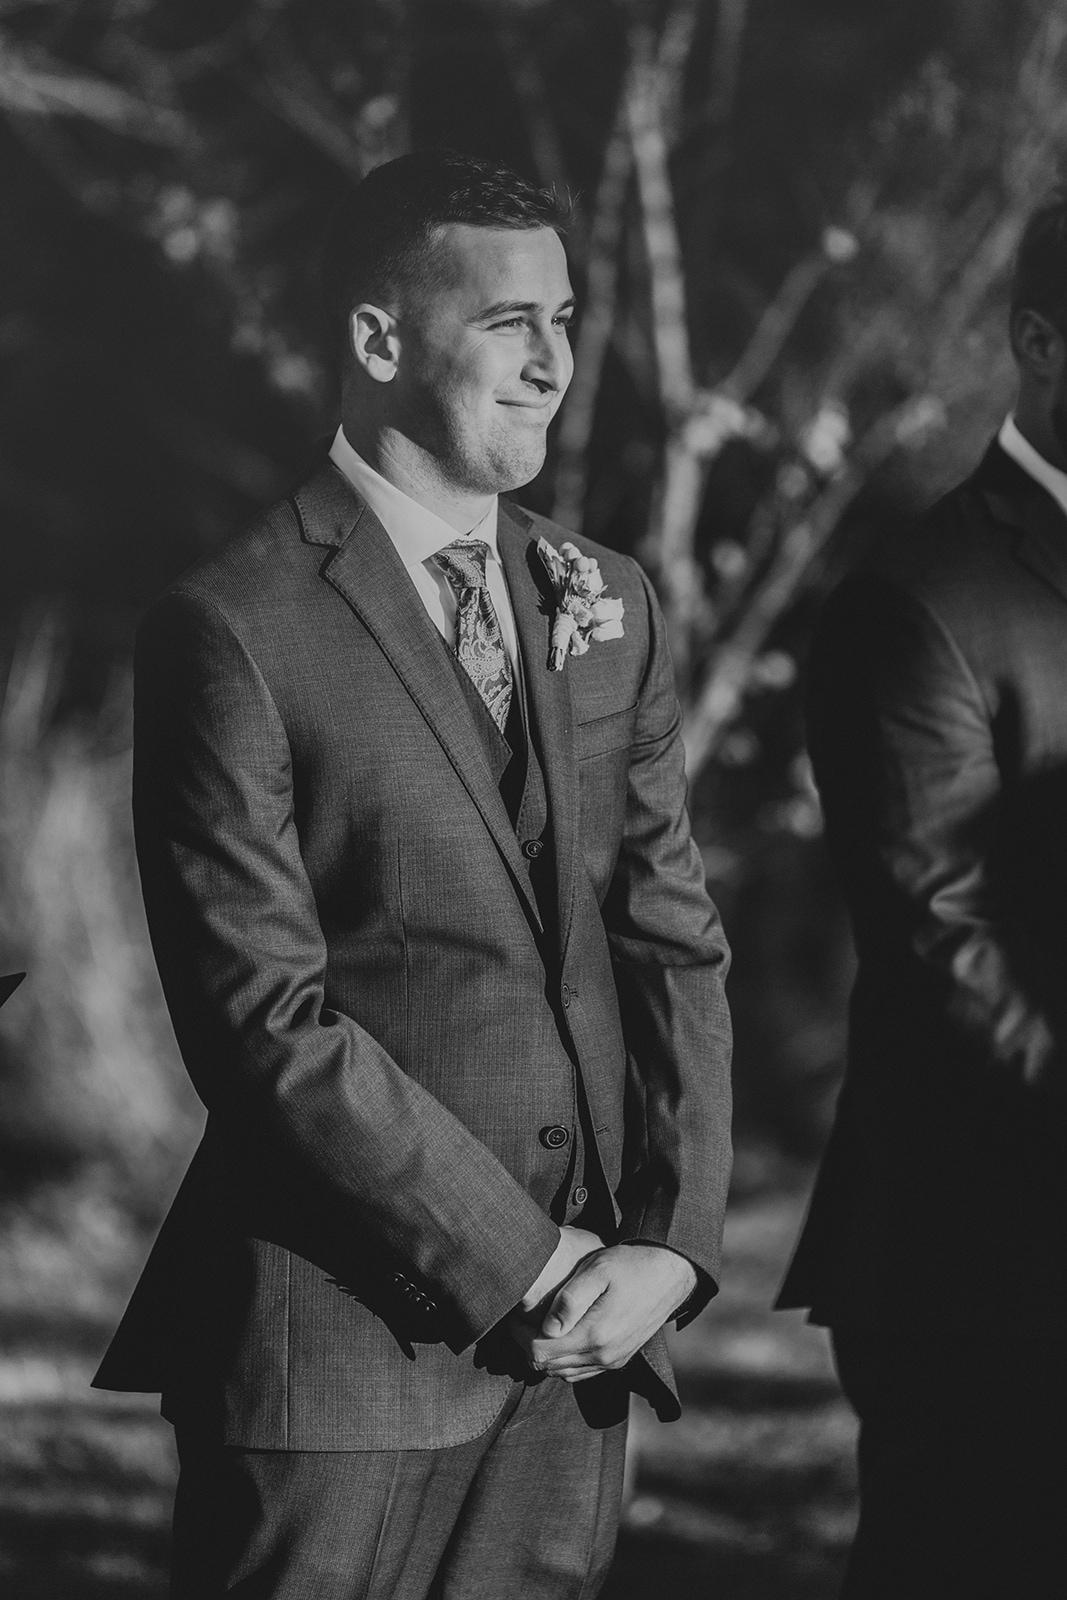 brielle-davis-events-48-fields-wedding-ceremony-groom-waiting.jpg